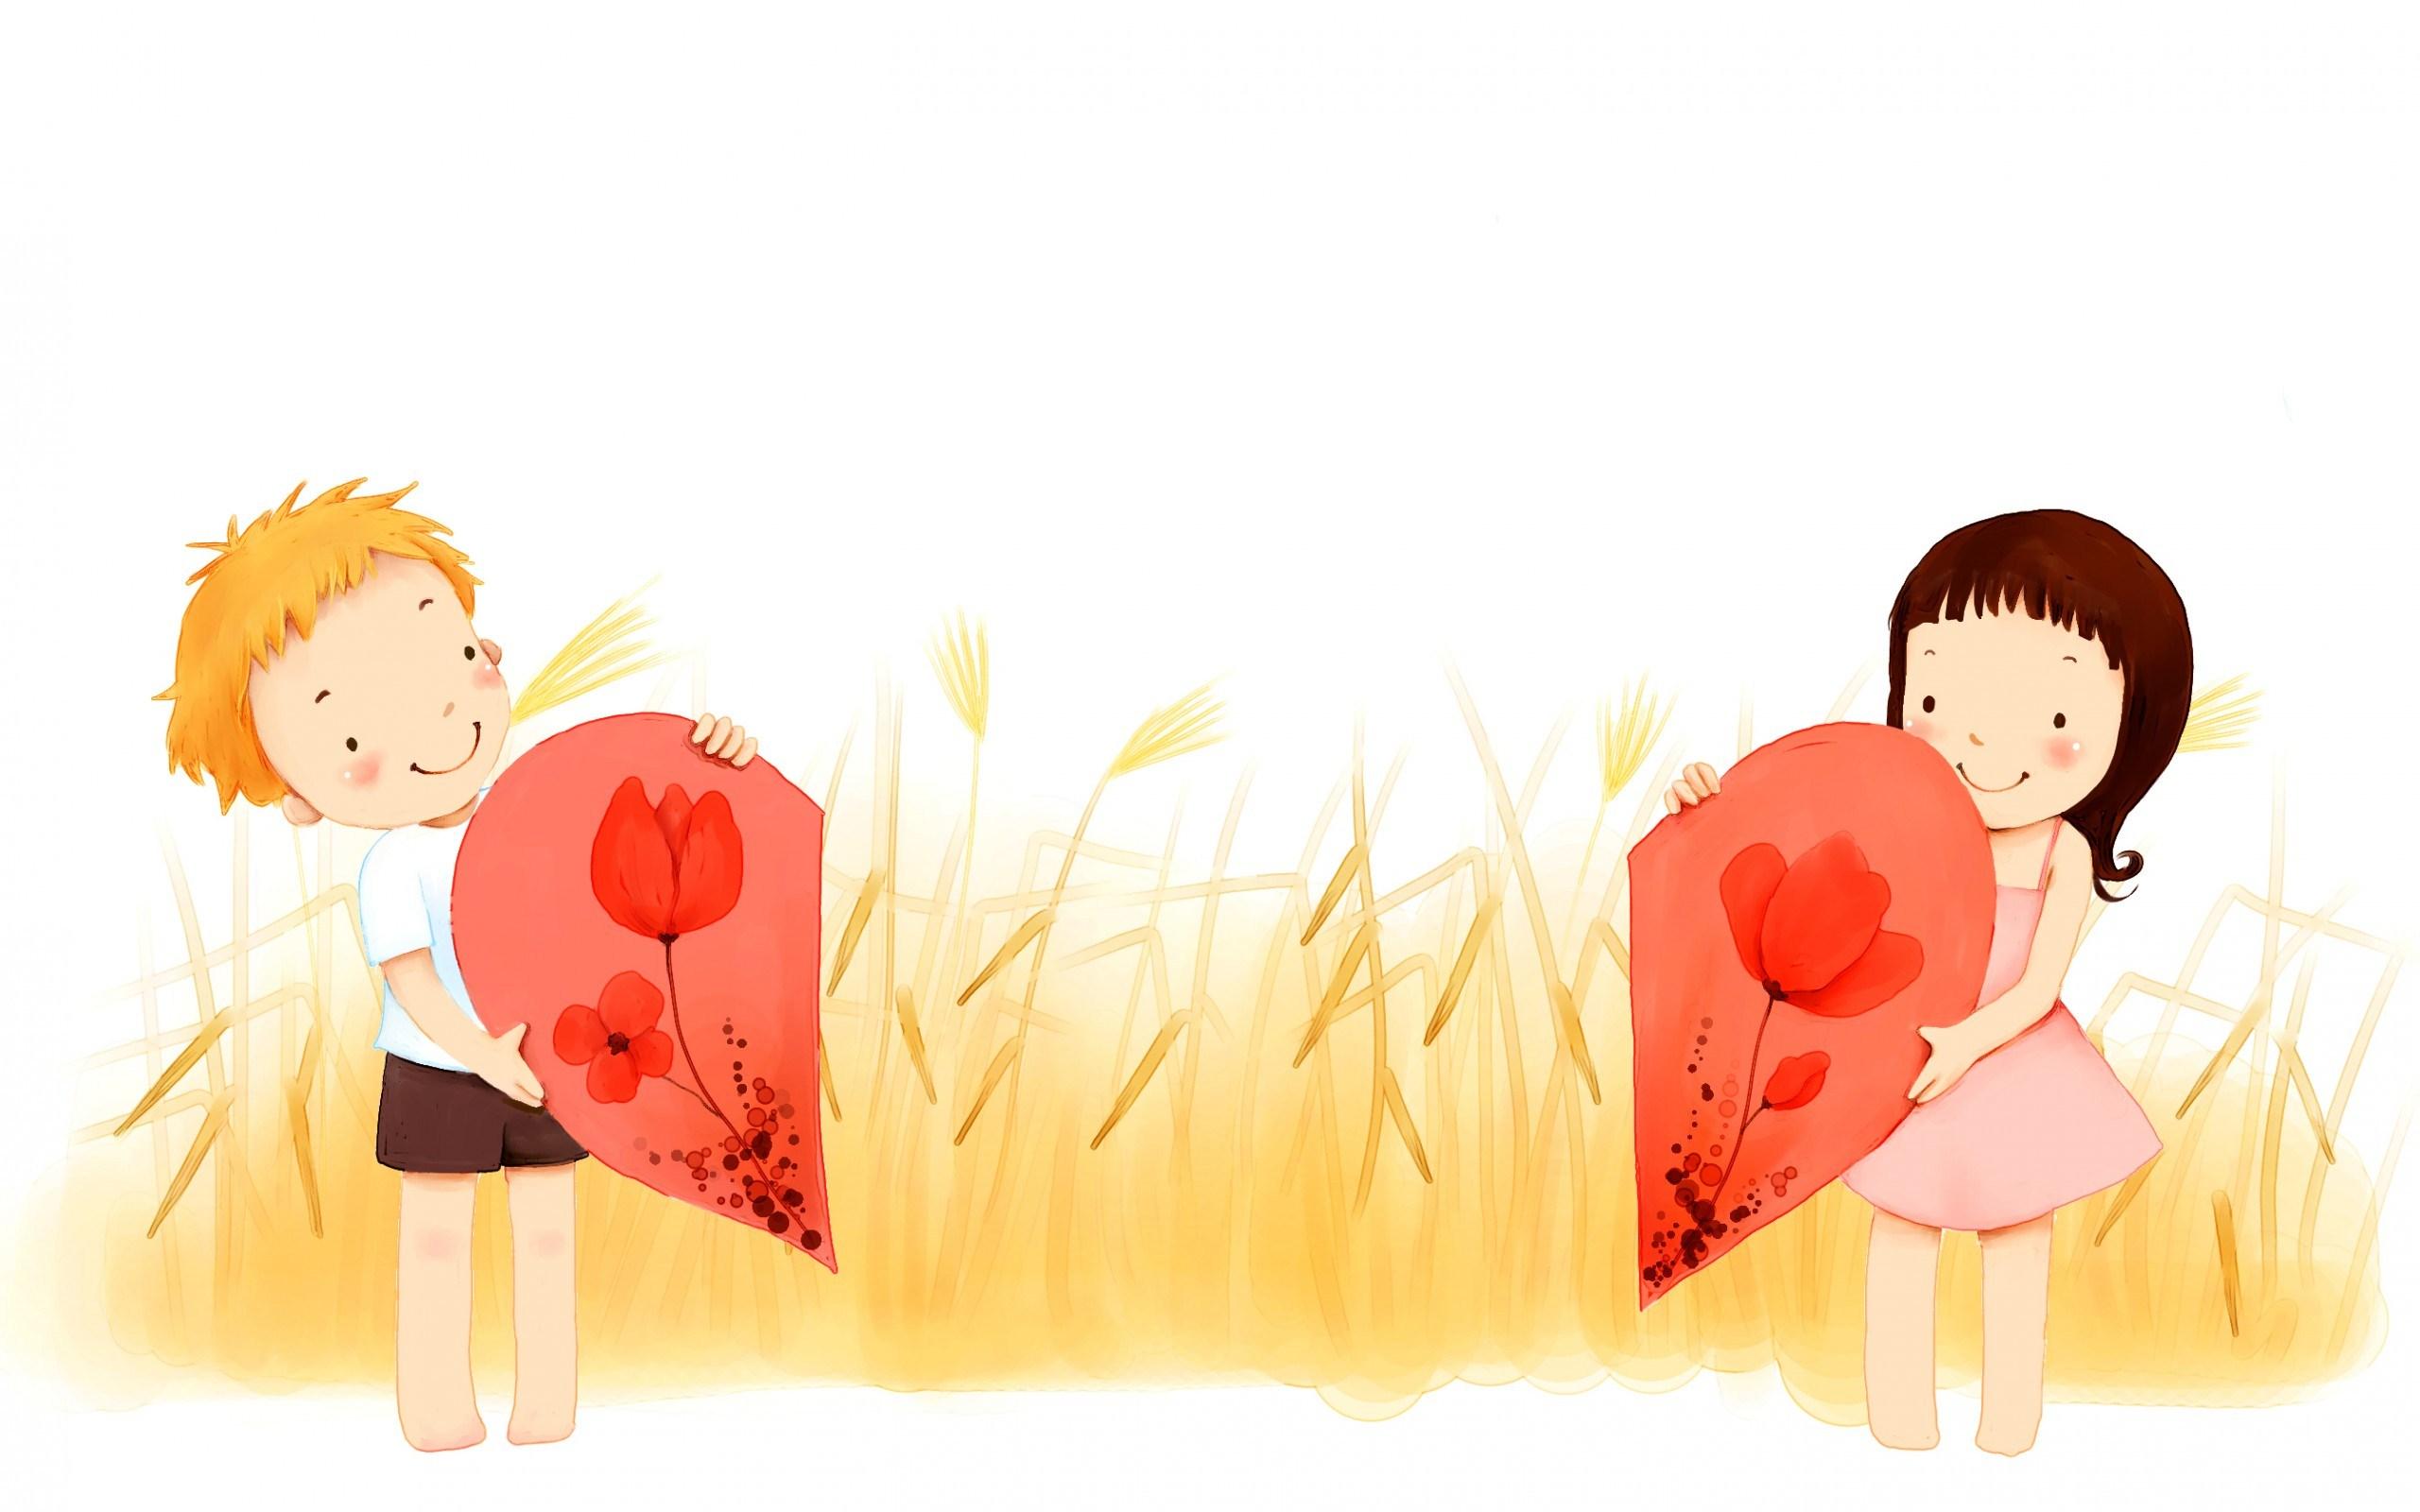 Beautiful-Art-Love-Girl-And-Boy-Heart-Wallpaper-Background